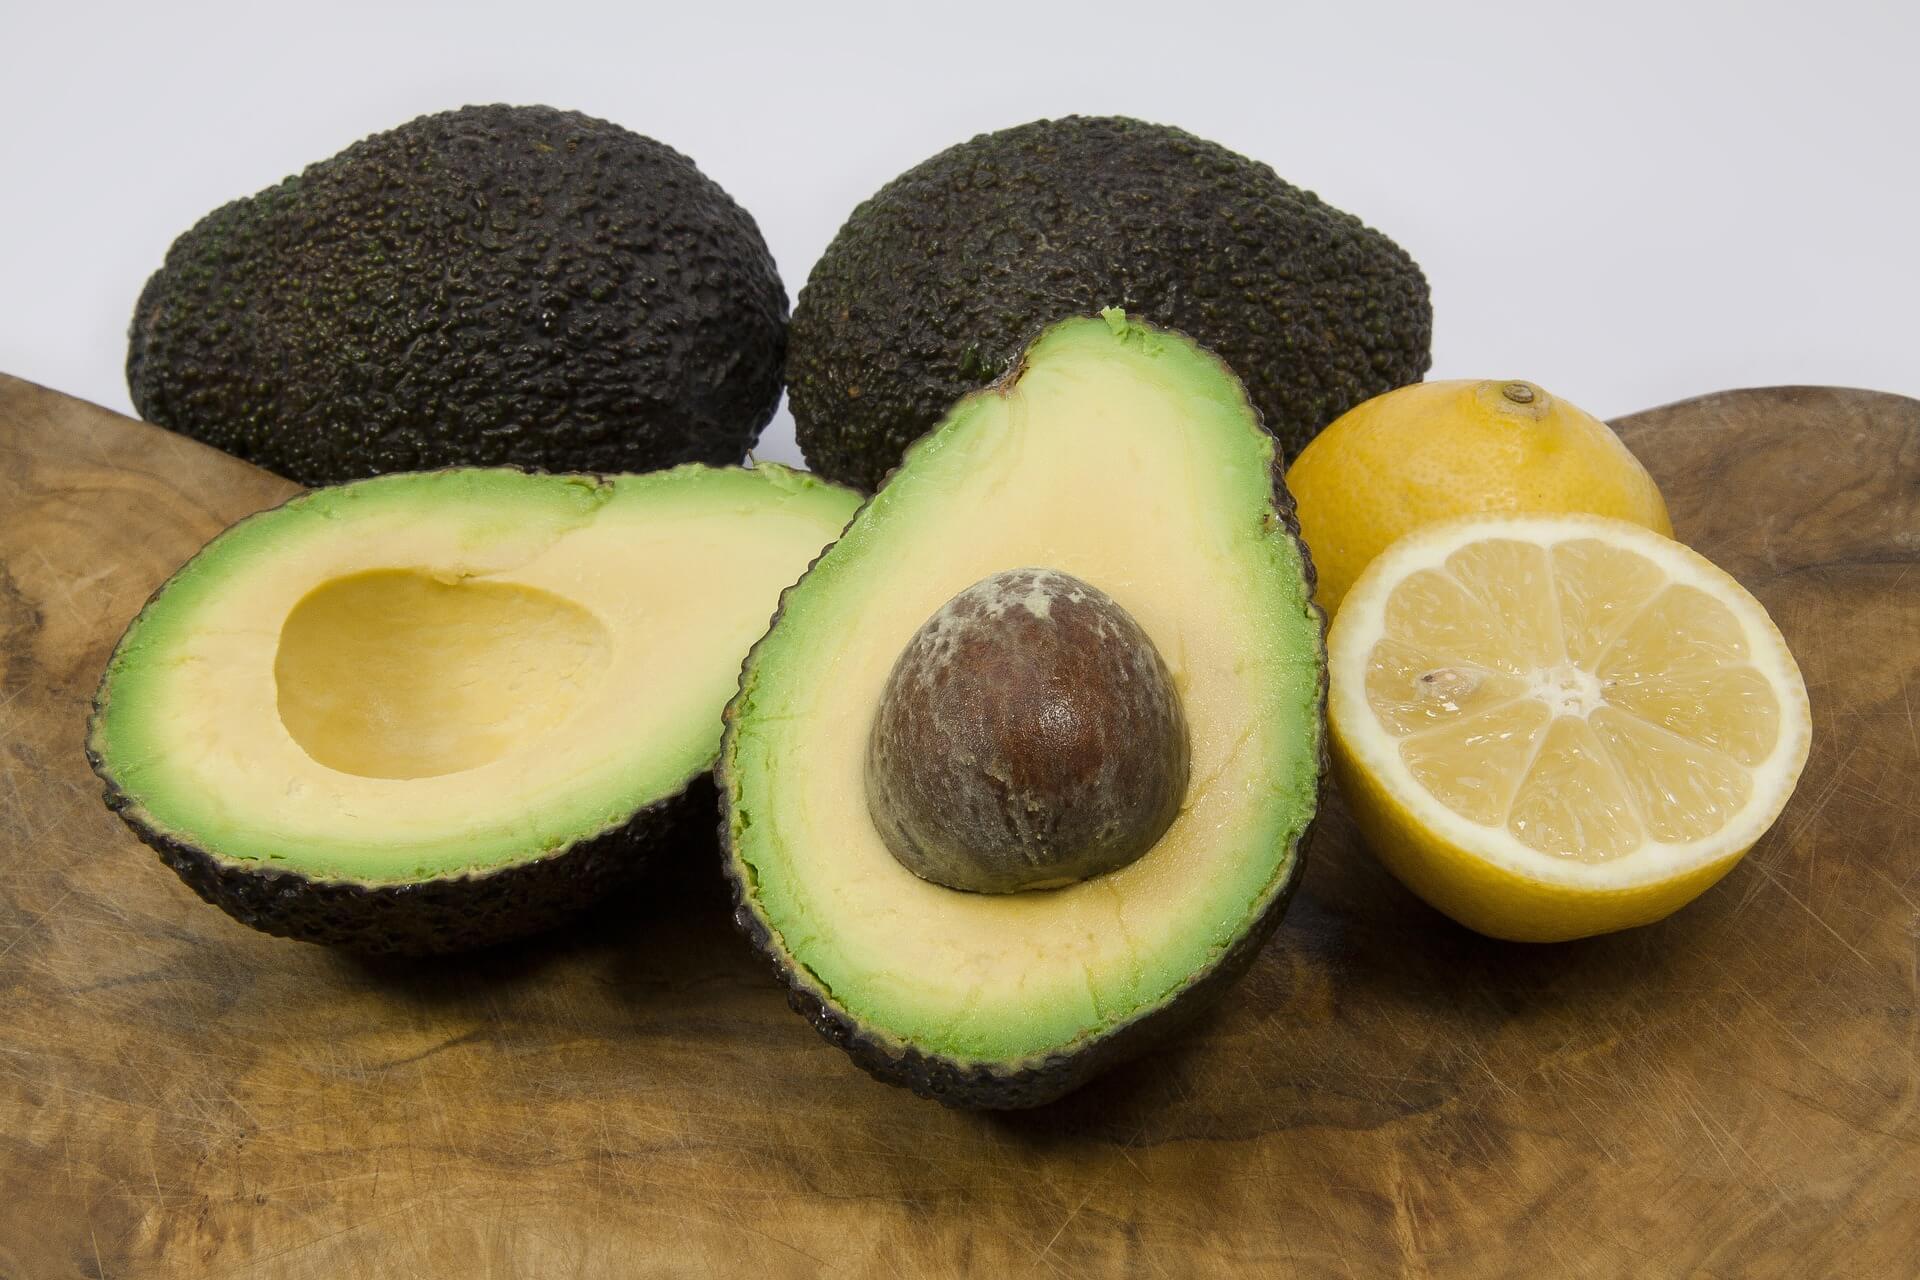 Avocado gesundes fetthaltiges Lebensmittel